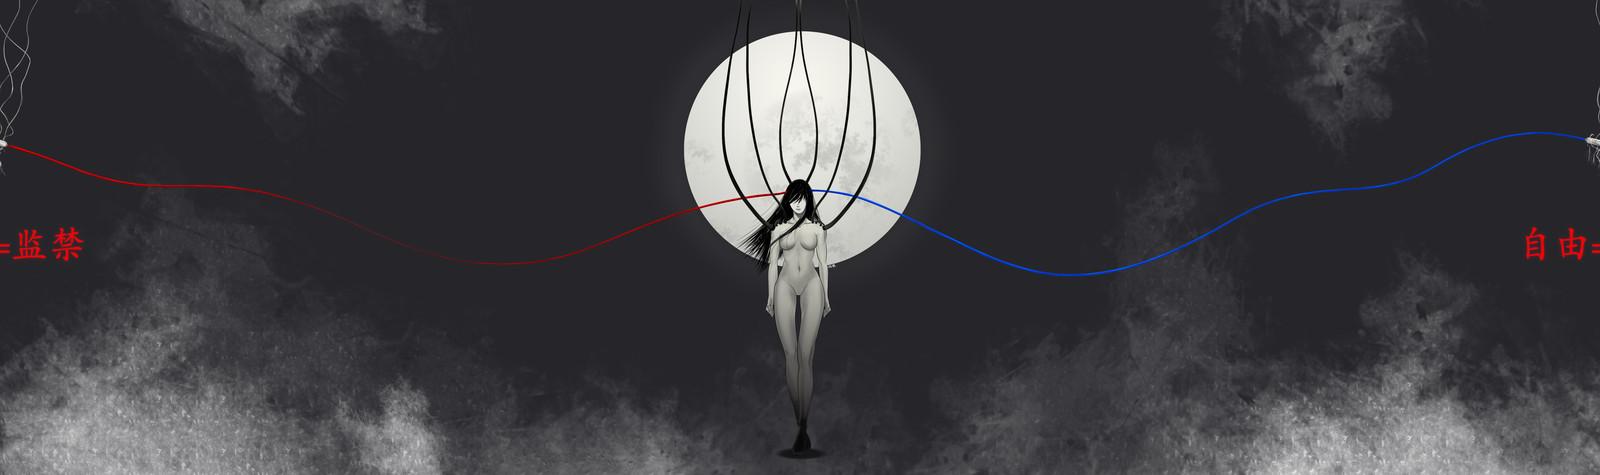 Cyberpunk Girl by hugo matilde